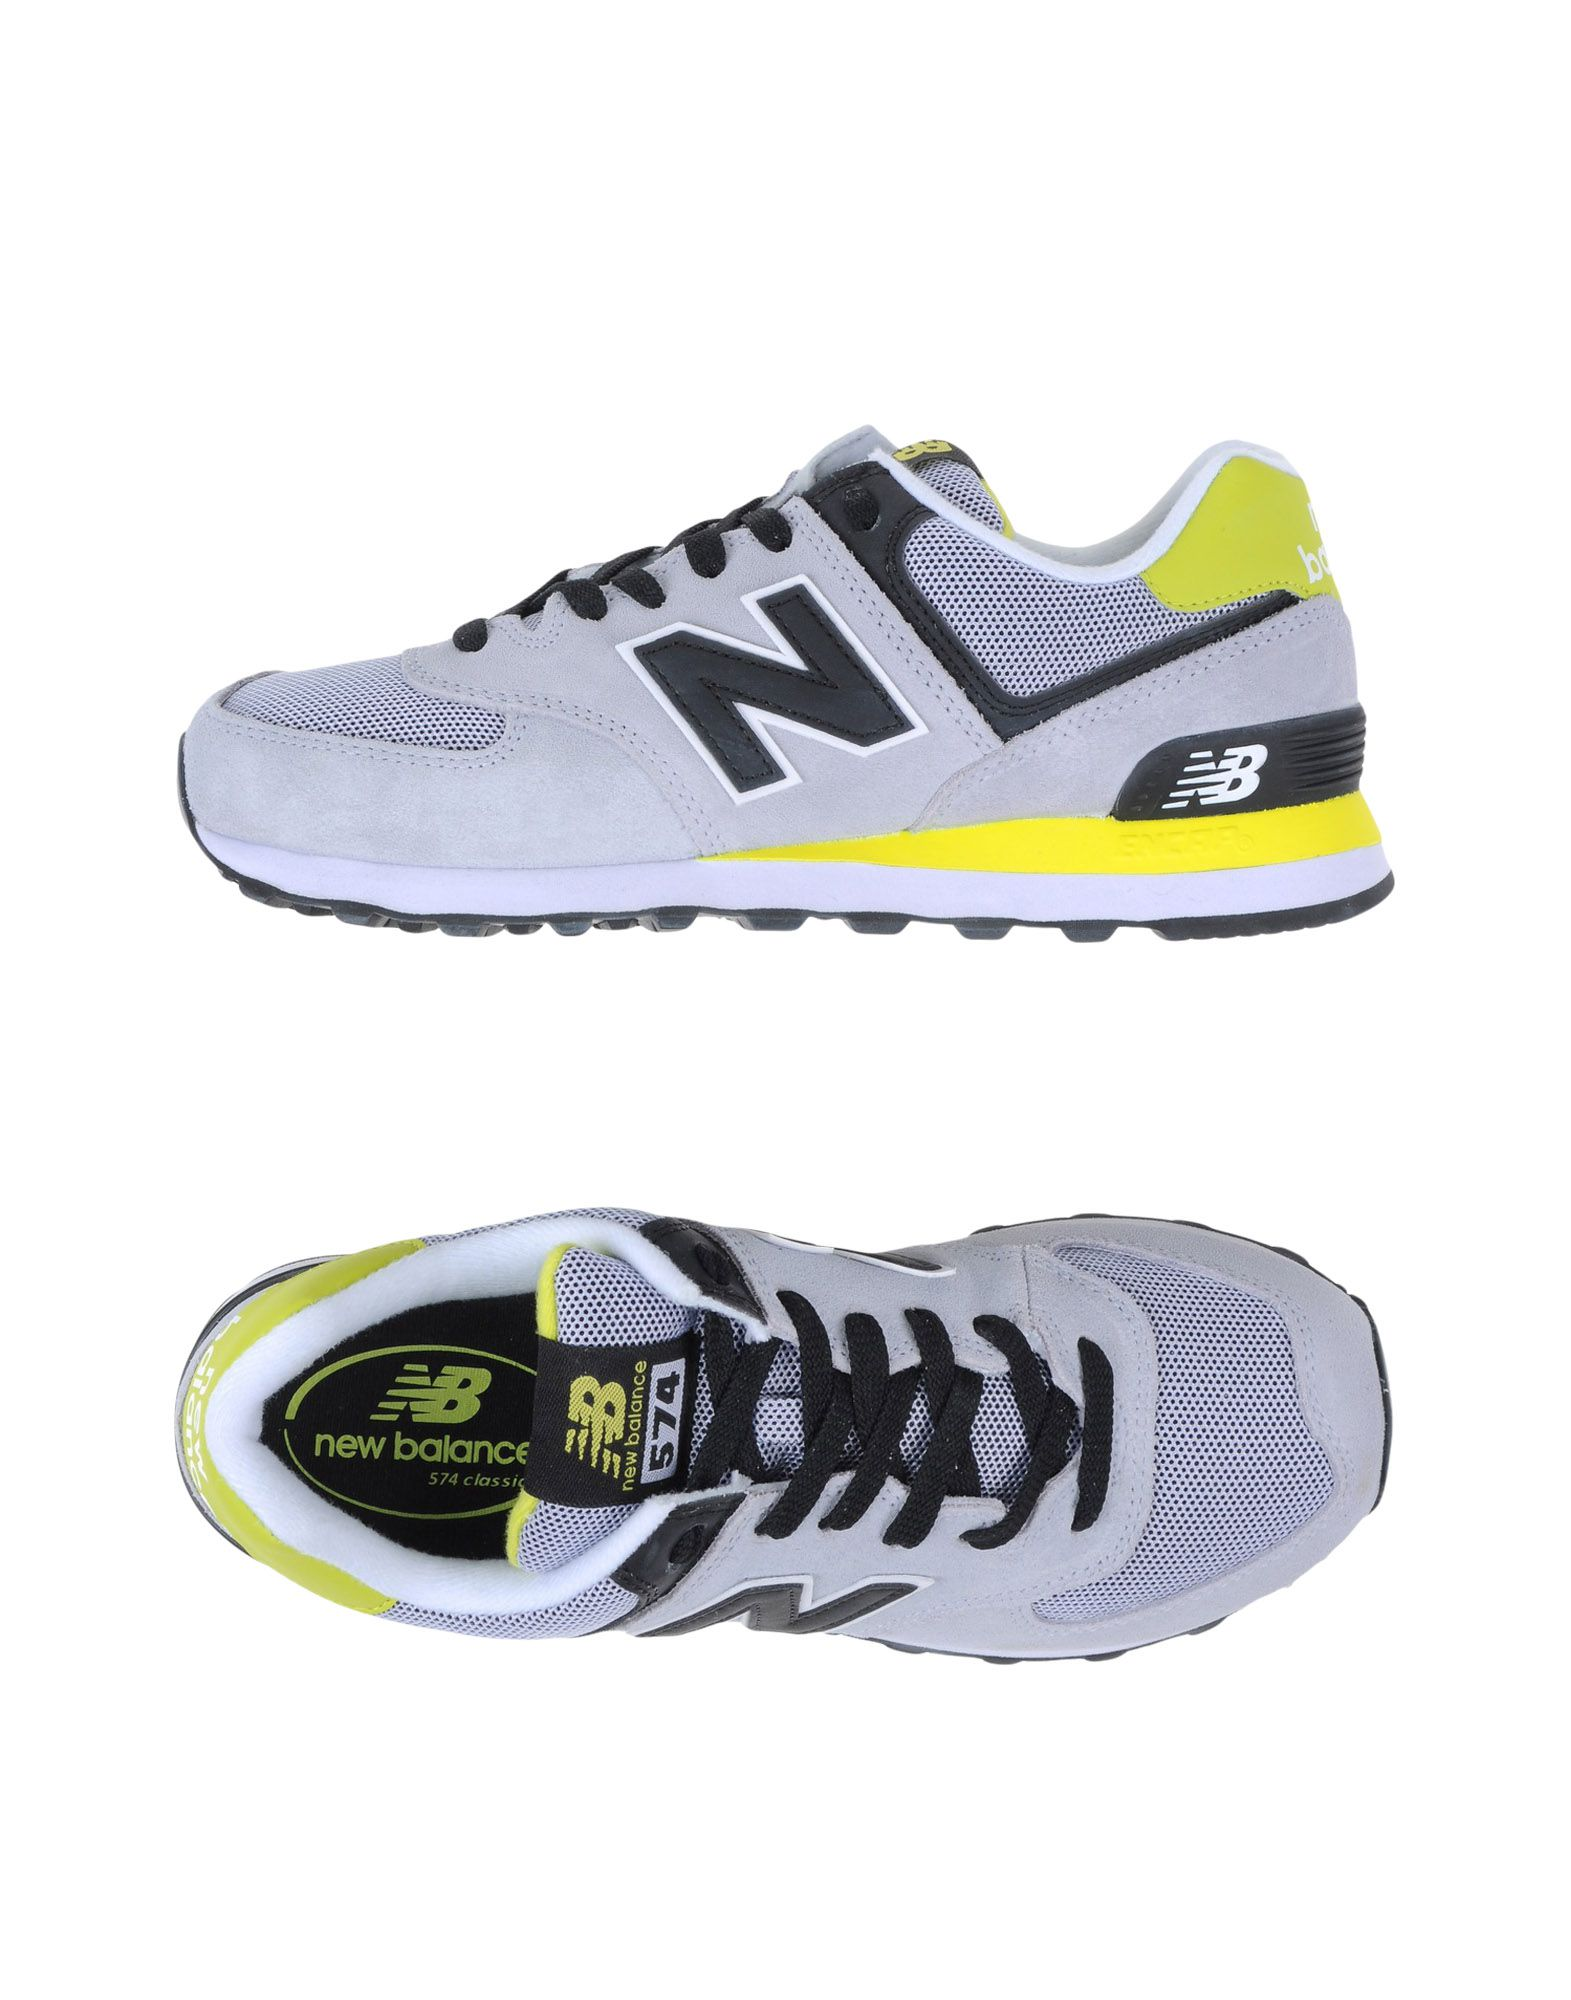 New Balance Gute 574 Suede Mesh Seasonal  44989953LC Gute Balance Qualität beliebte Schuhe ddb4ab